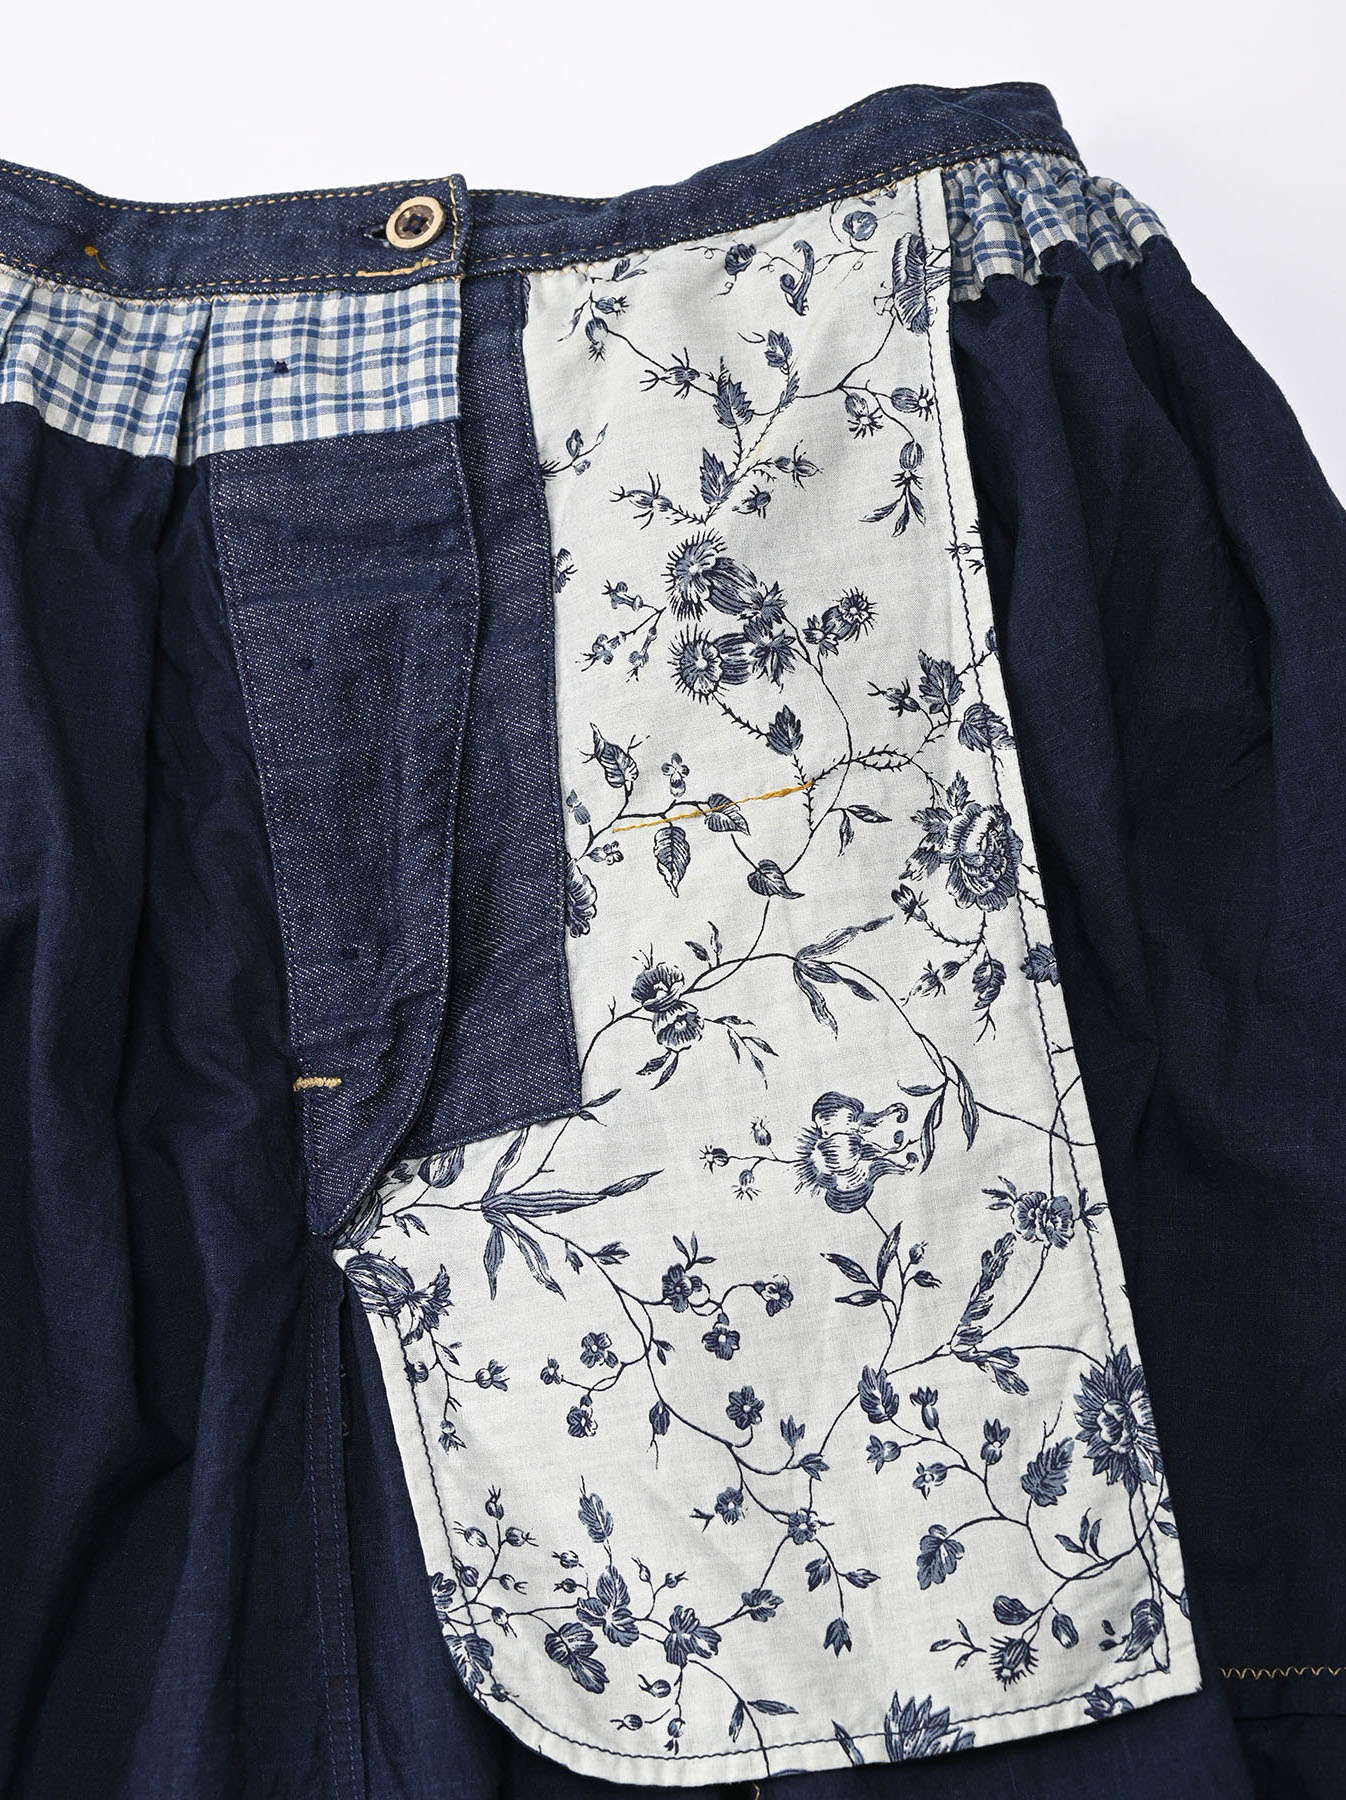 Indigo Tappet Patchwork Skirt-11